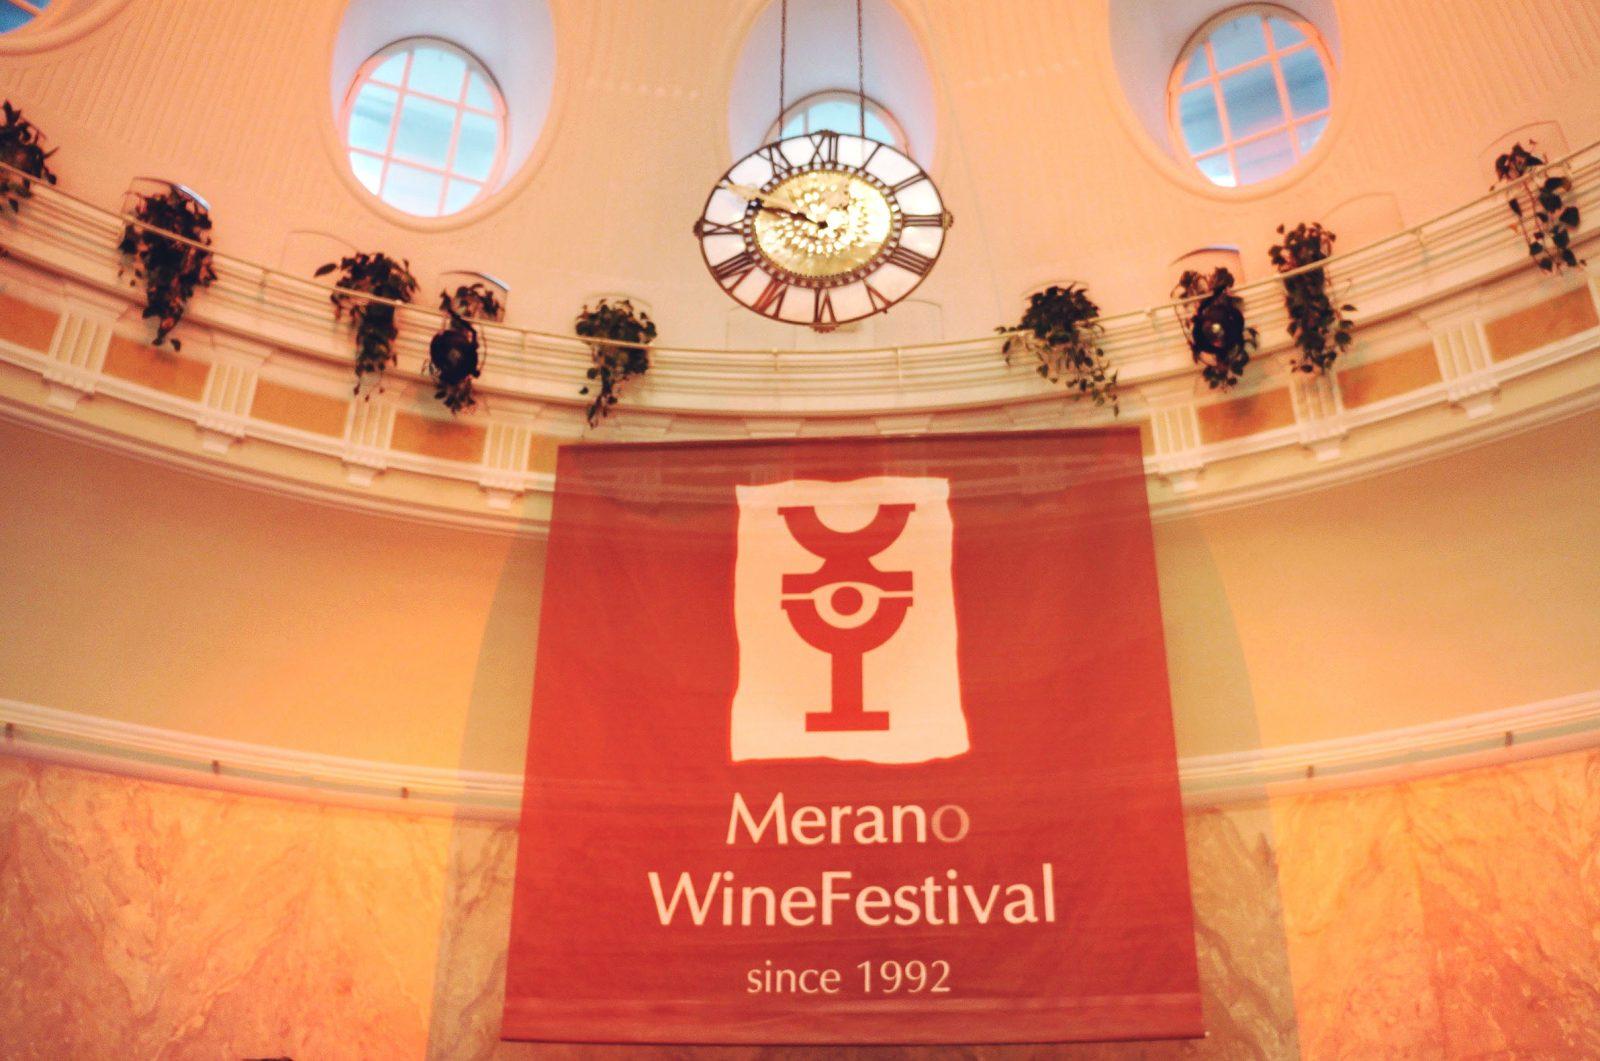 Merano WineFestival 2016